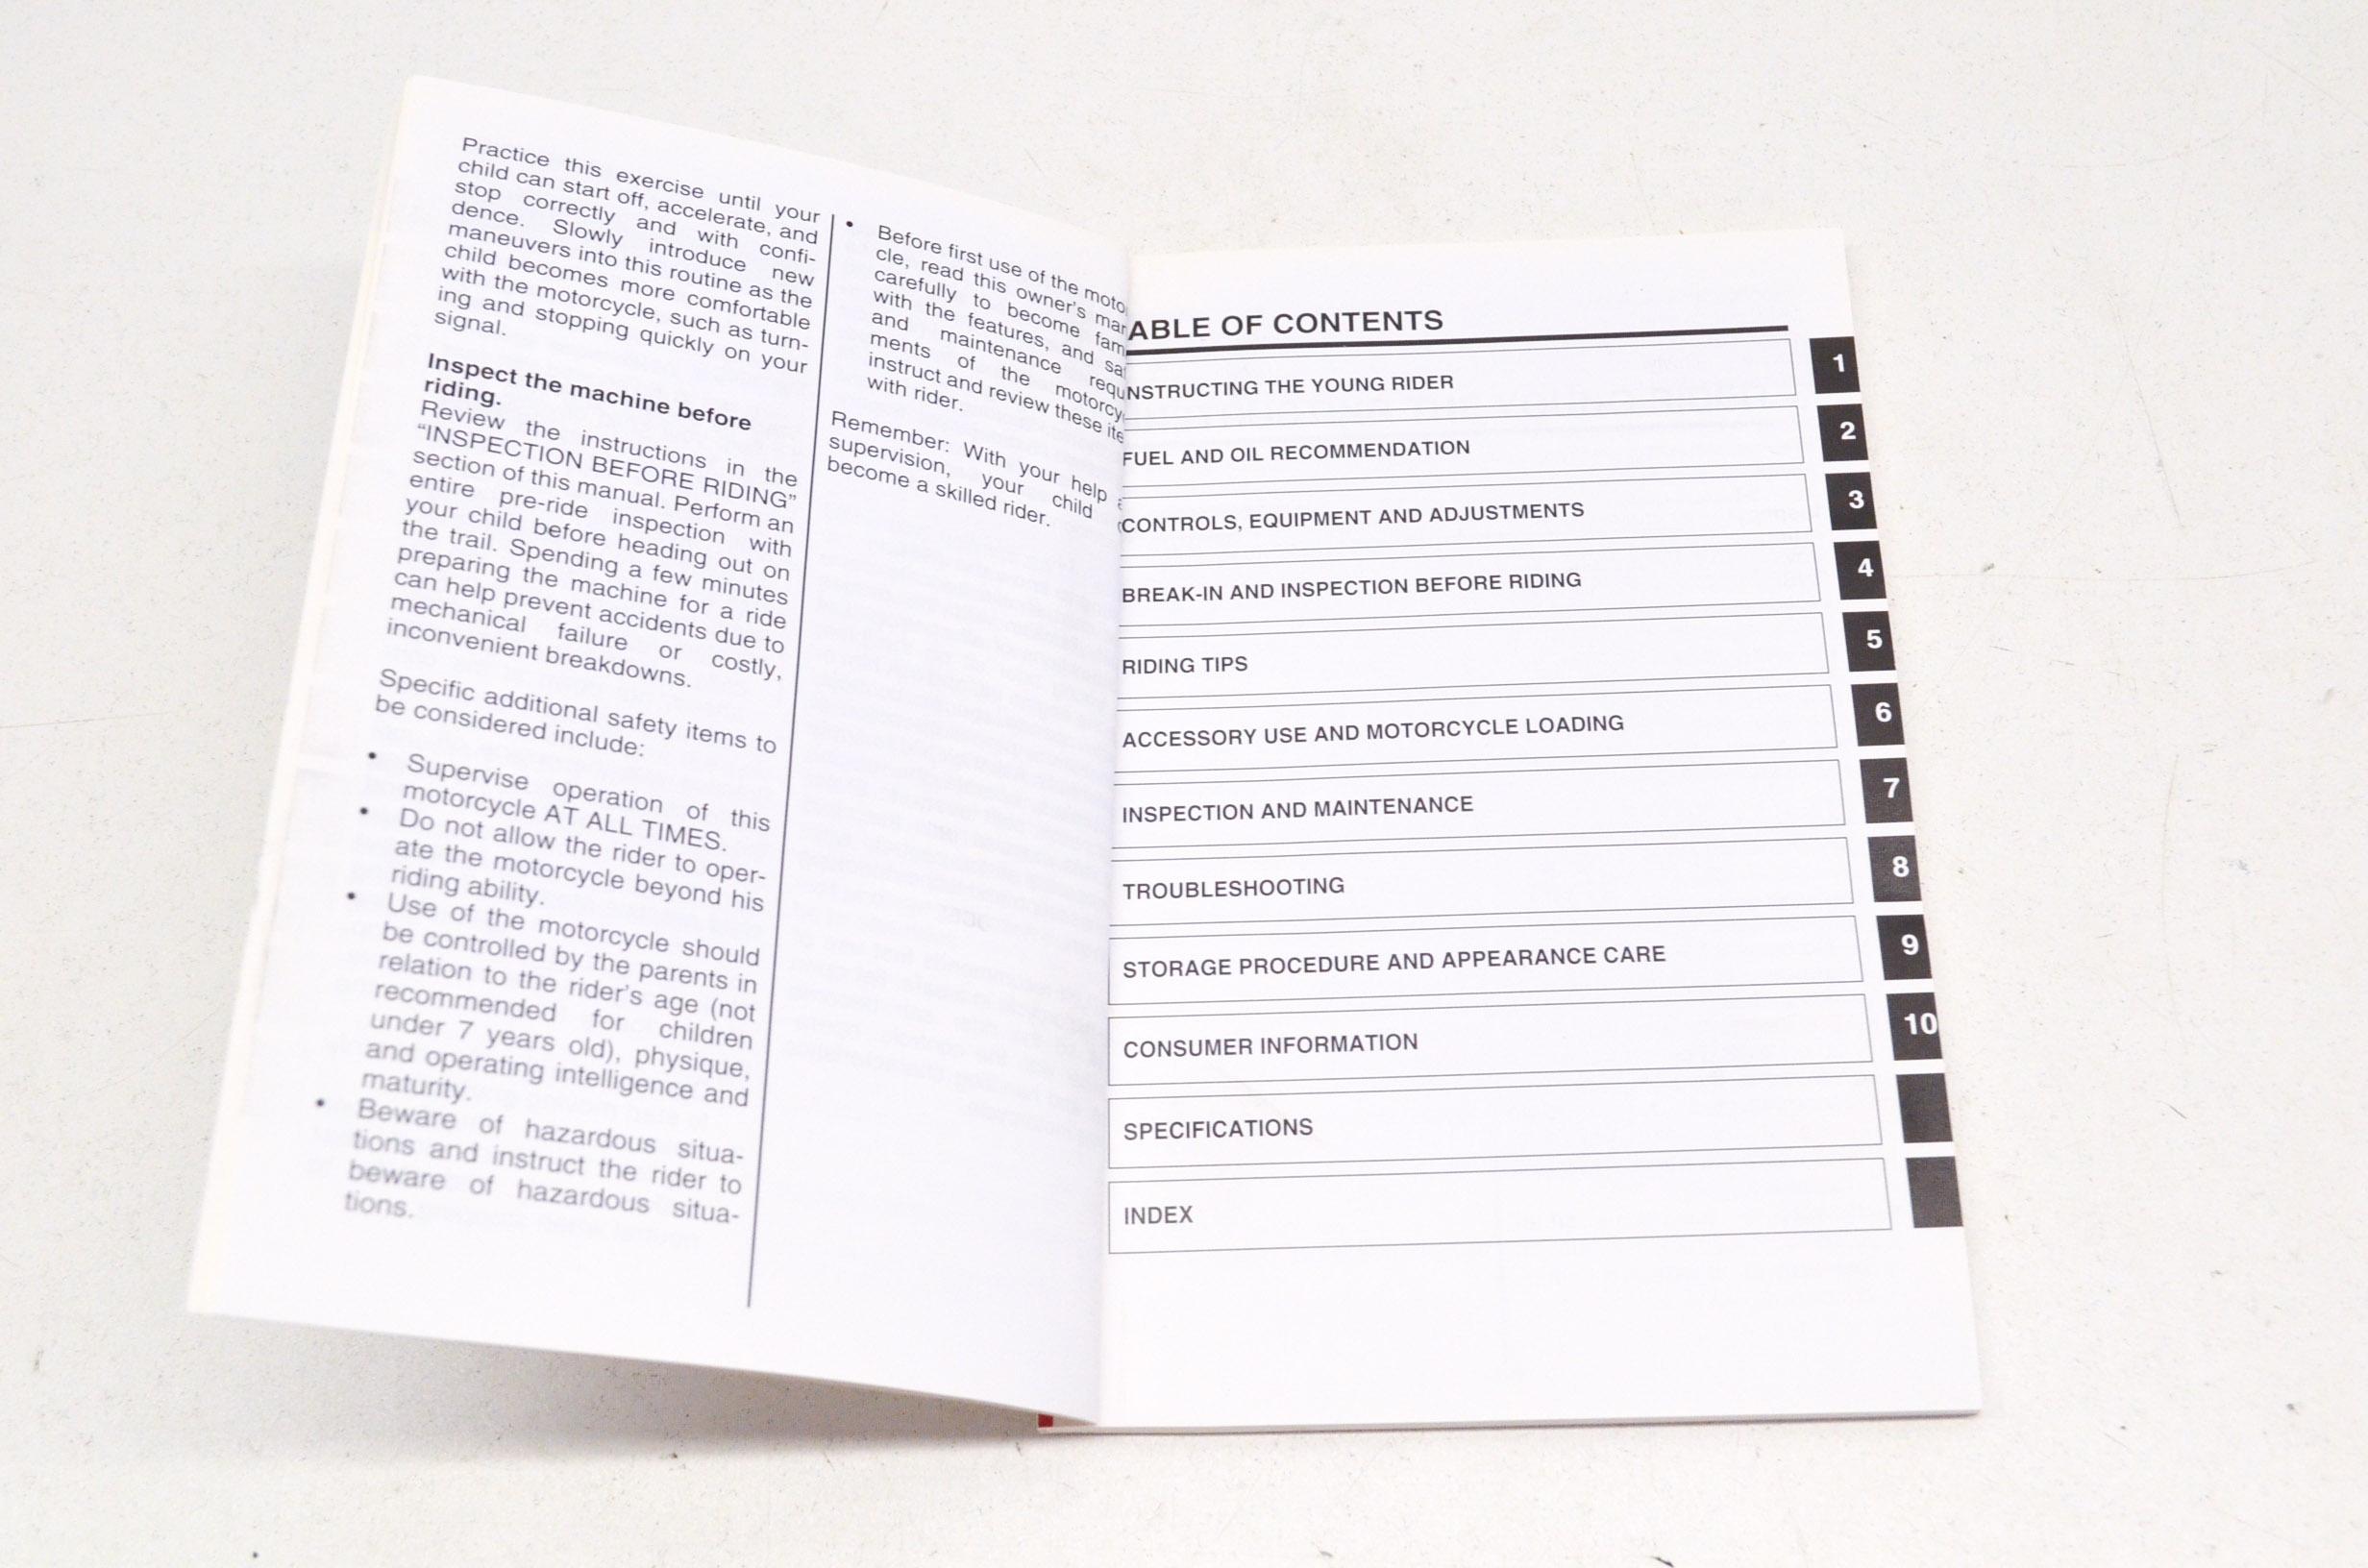 OEM Suzuki 99011-04493-03A Owner's Manual JR50K6 2006 NOS